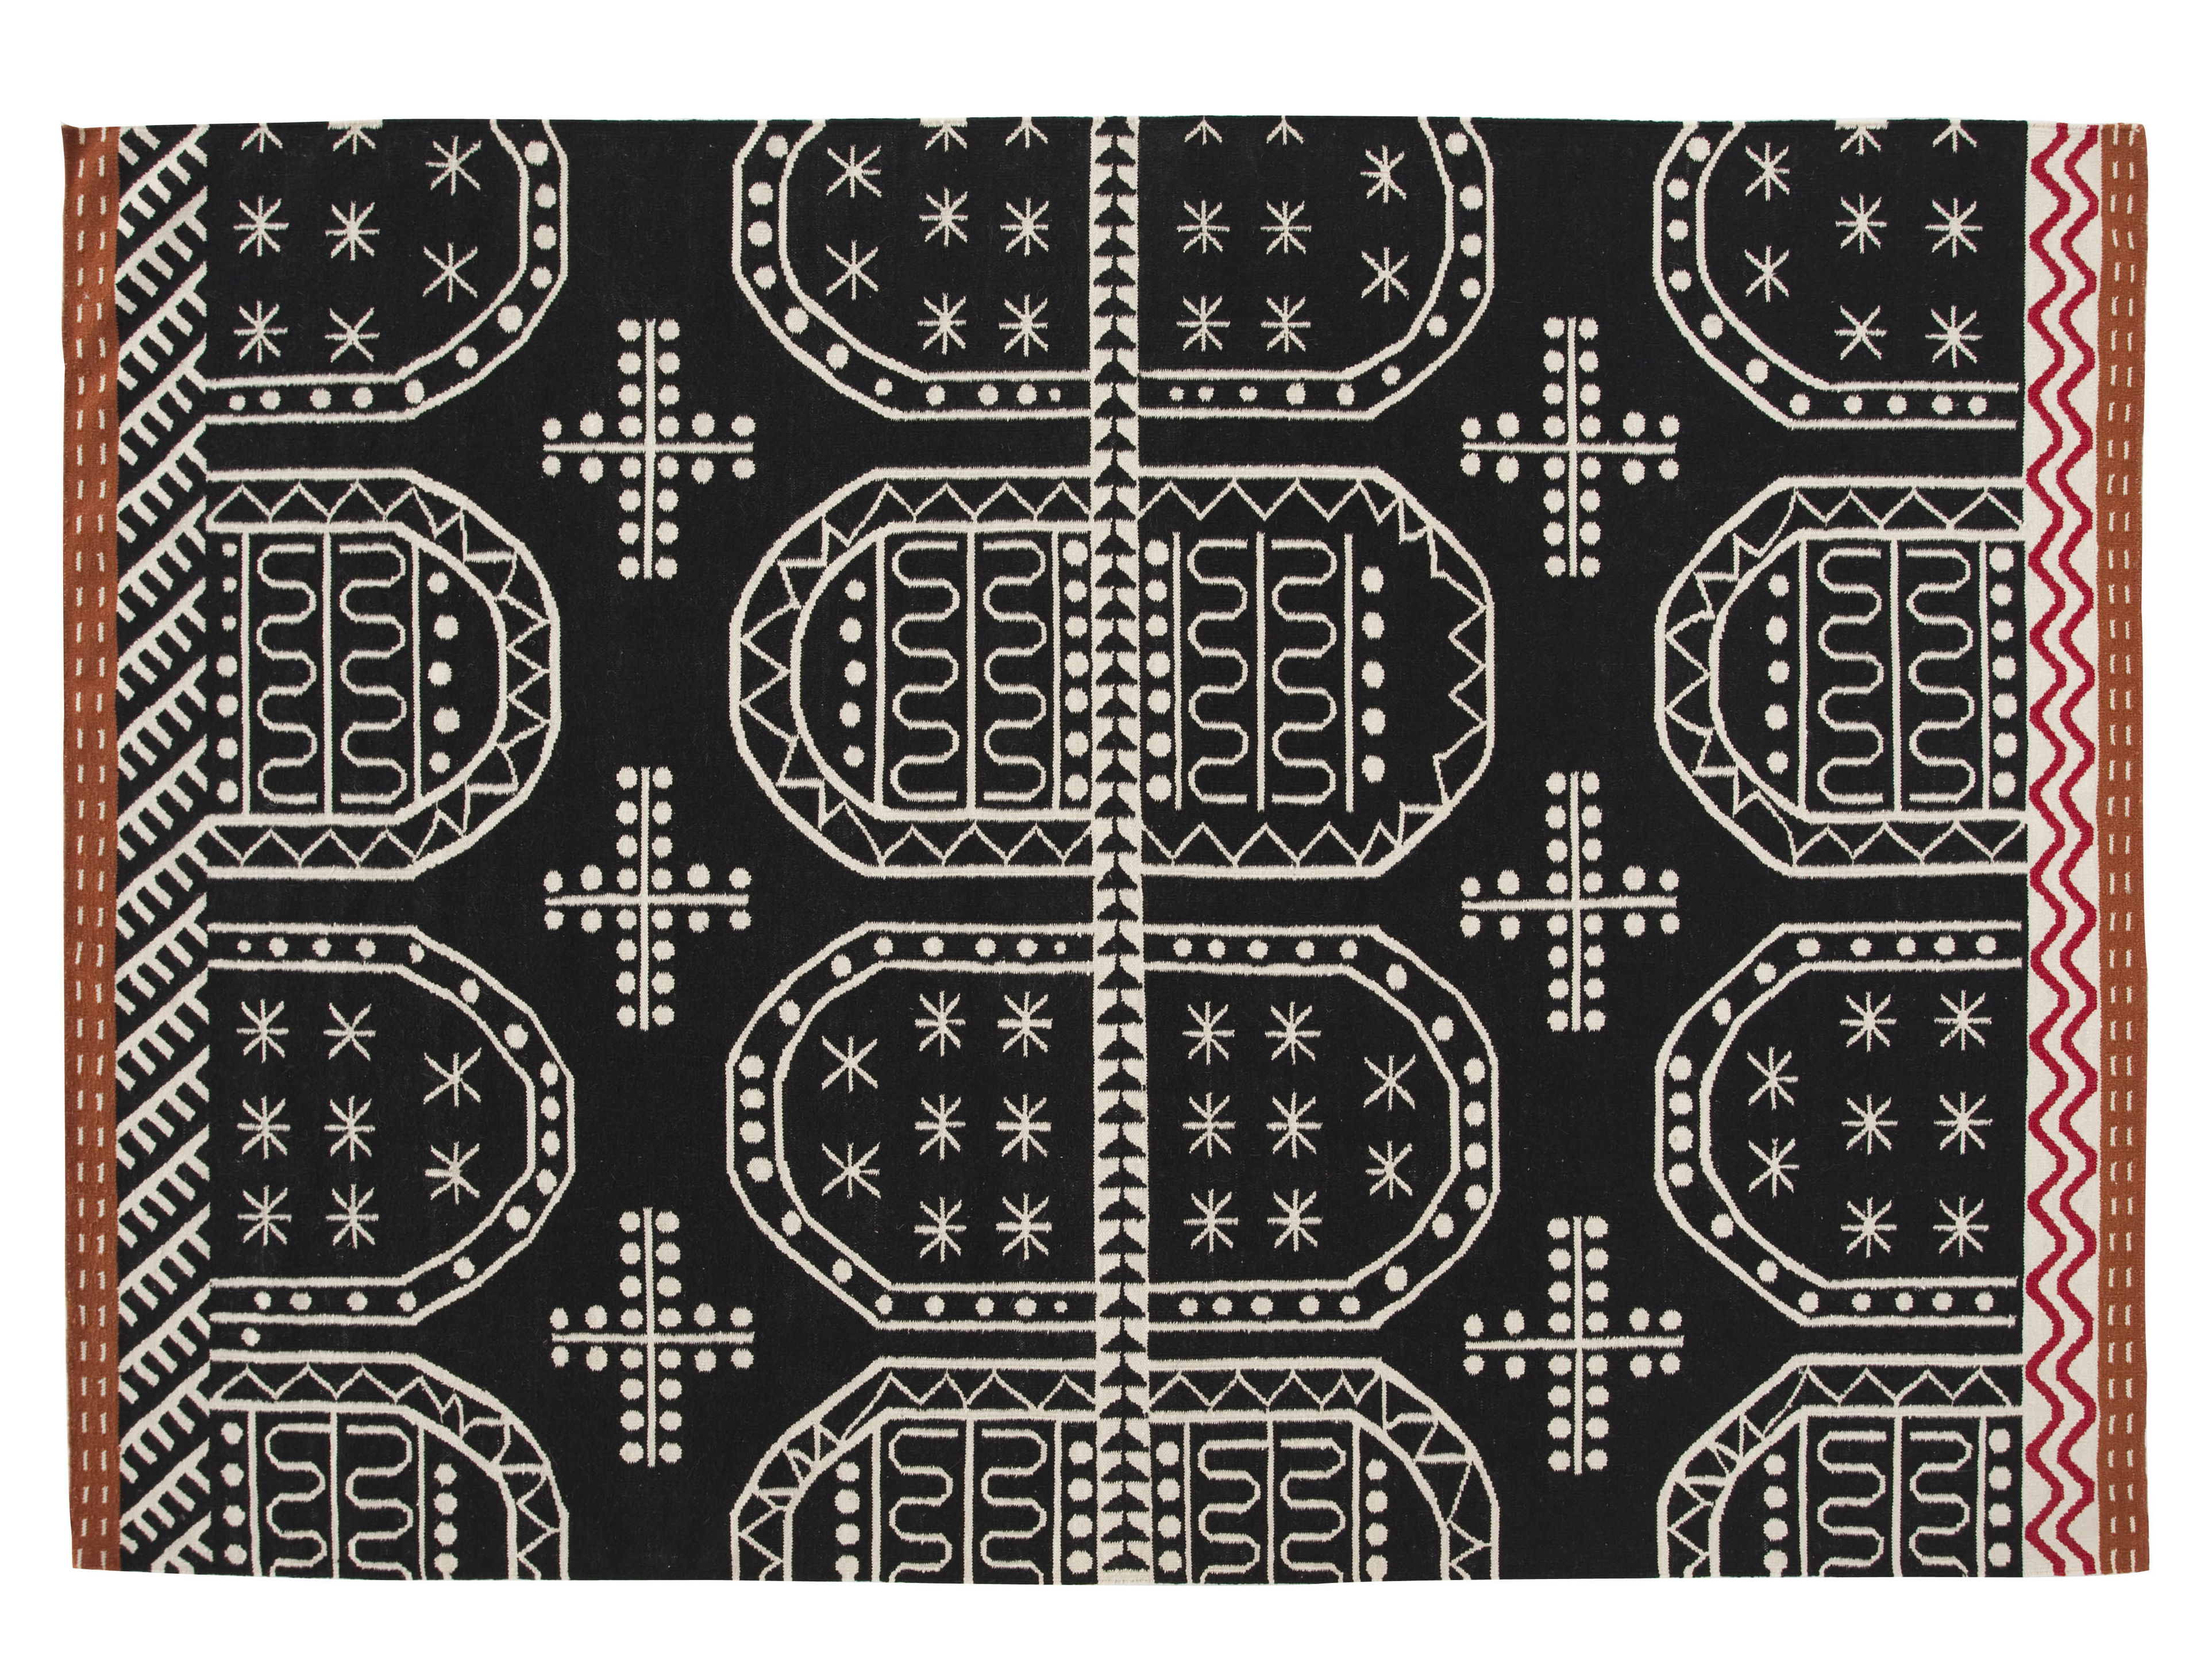 Déco - Tapis - Tapis Kilim Tasili / 240 x 170 cm - Gan - Noir - Laine vierge